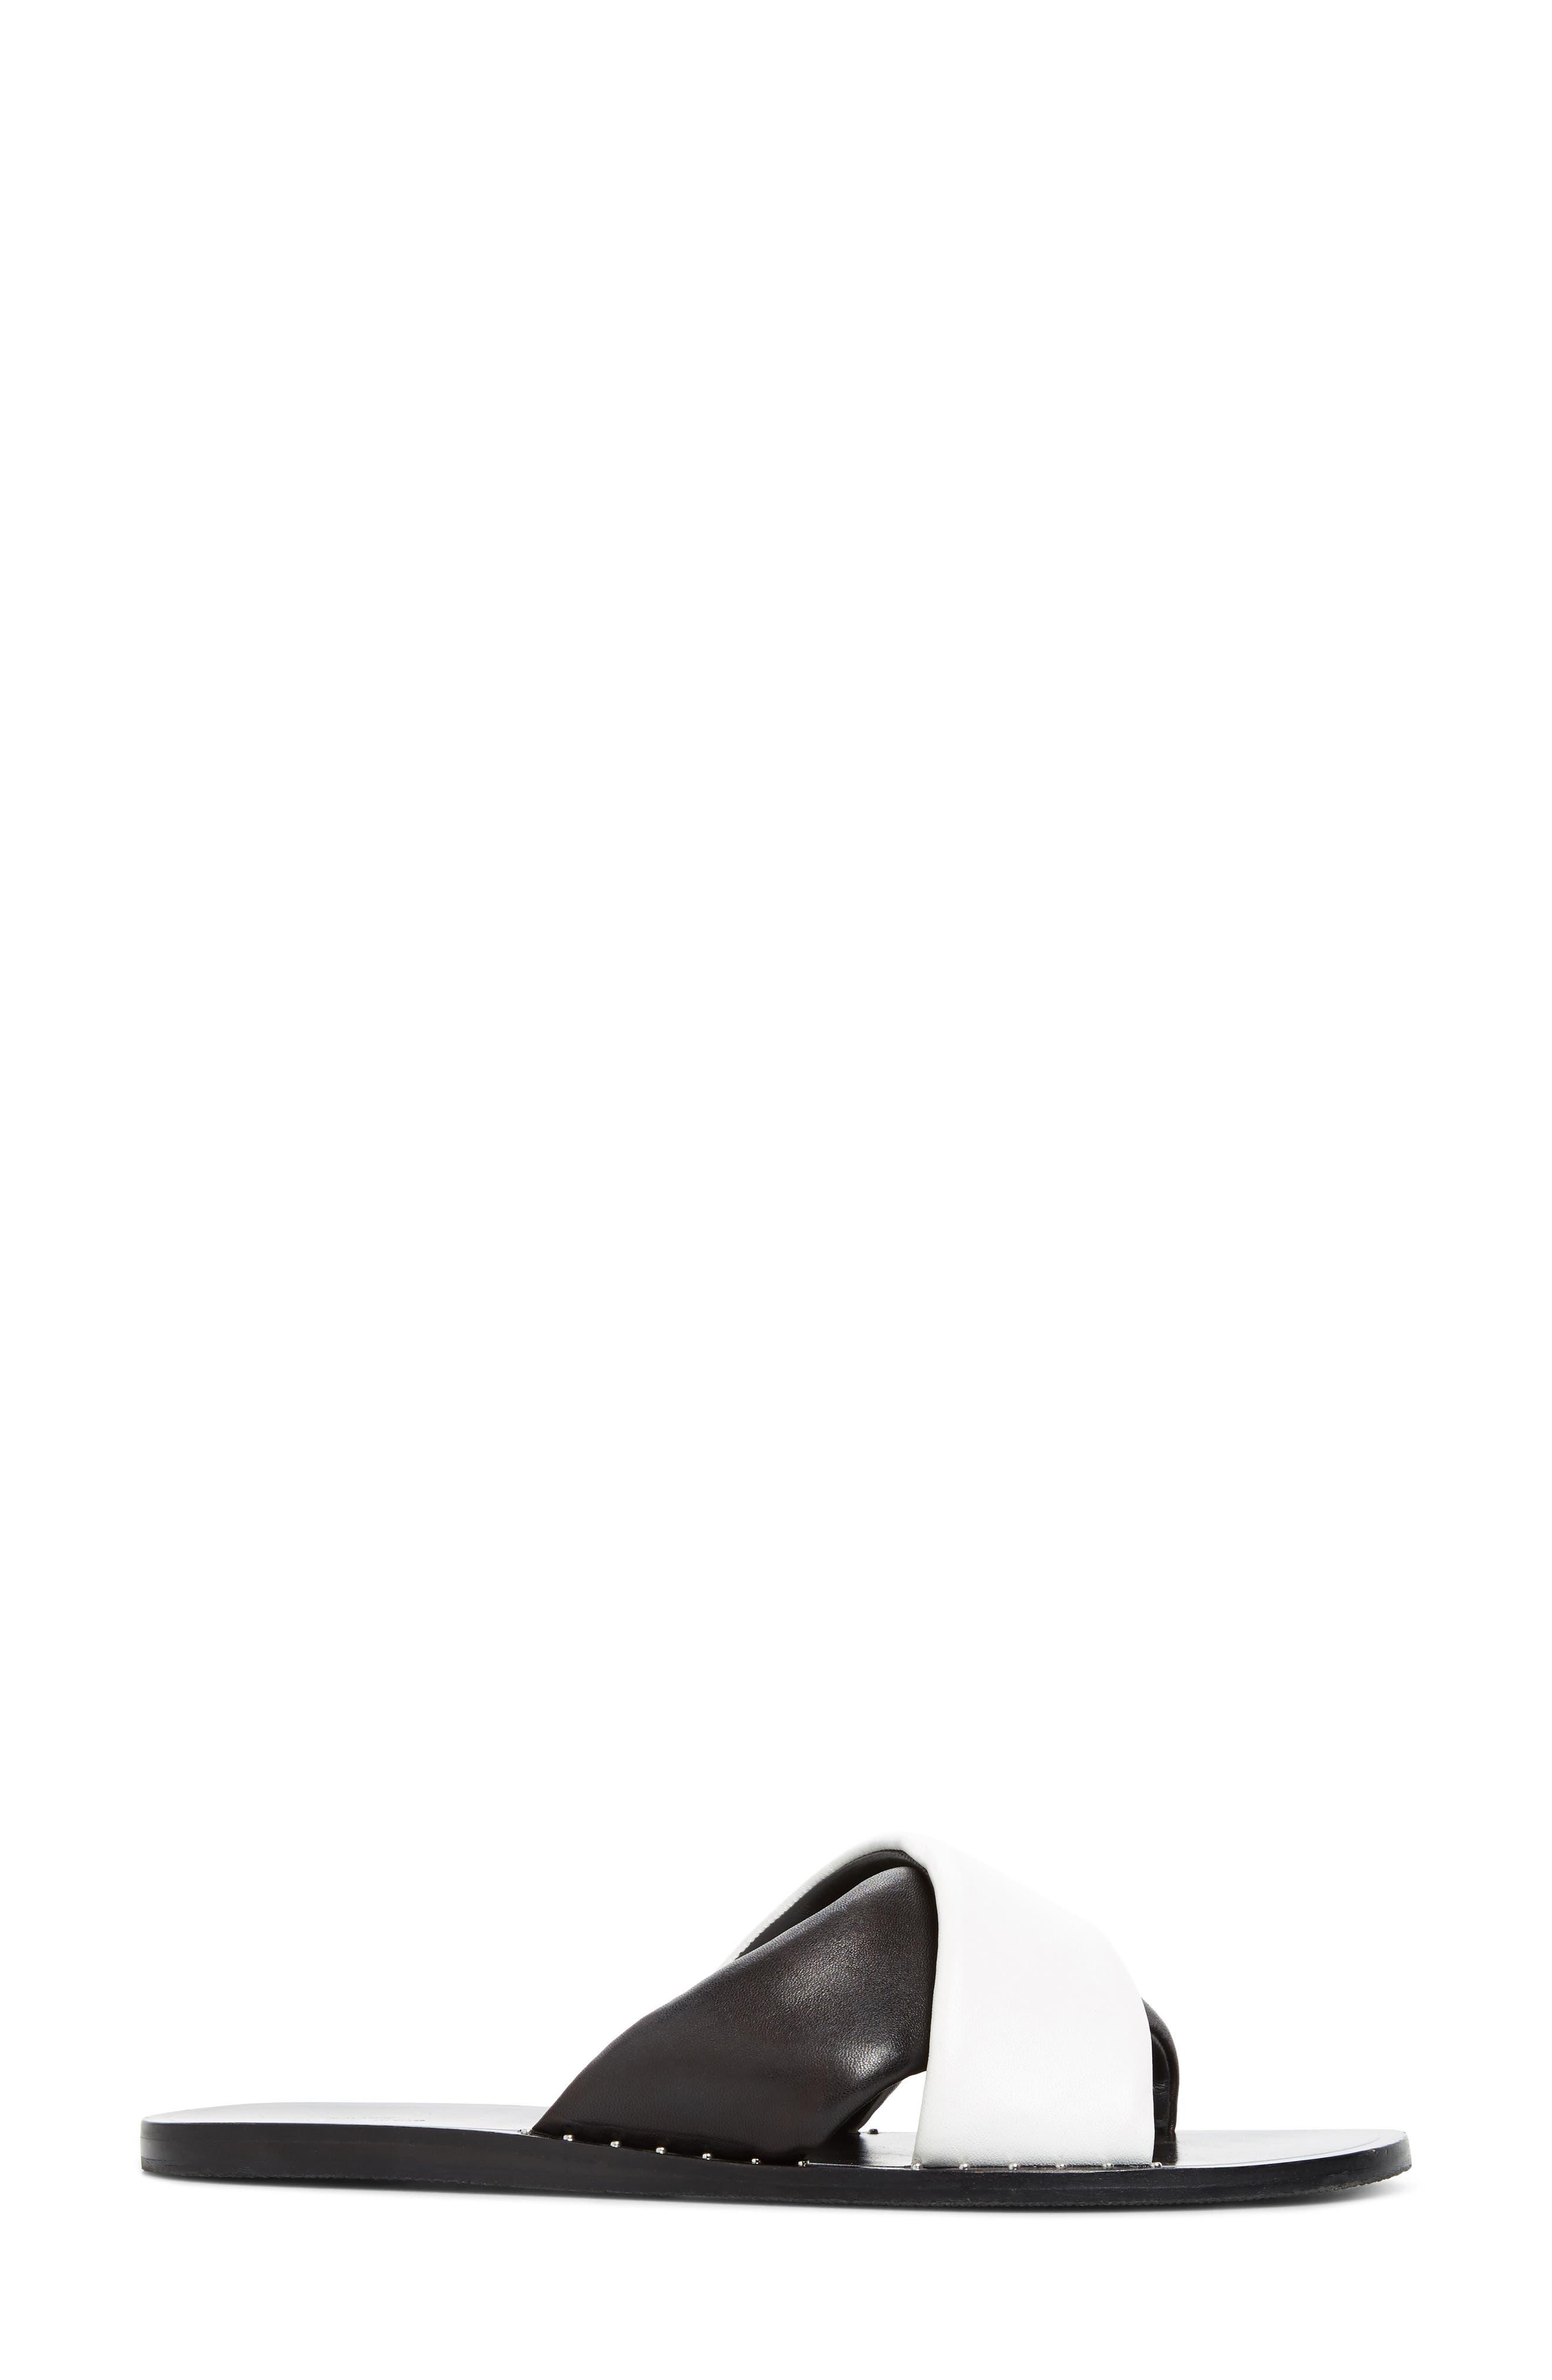 Keaton Slide Sandal,                             Alternate thumbnail 3, color,                             002